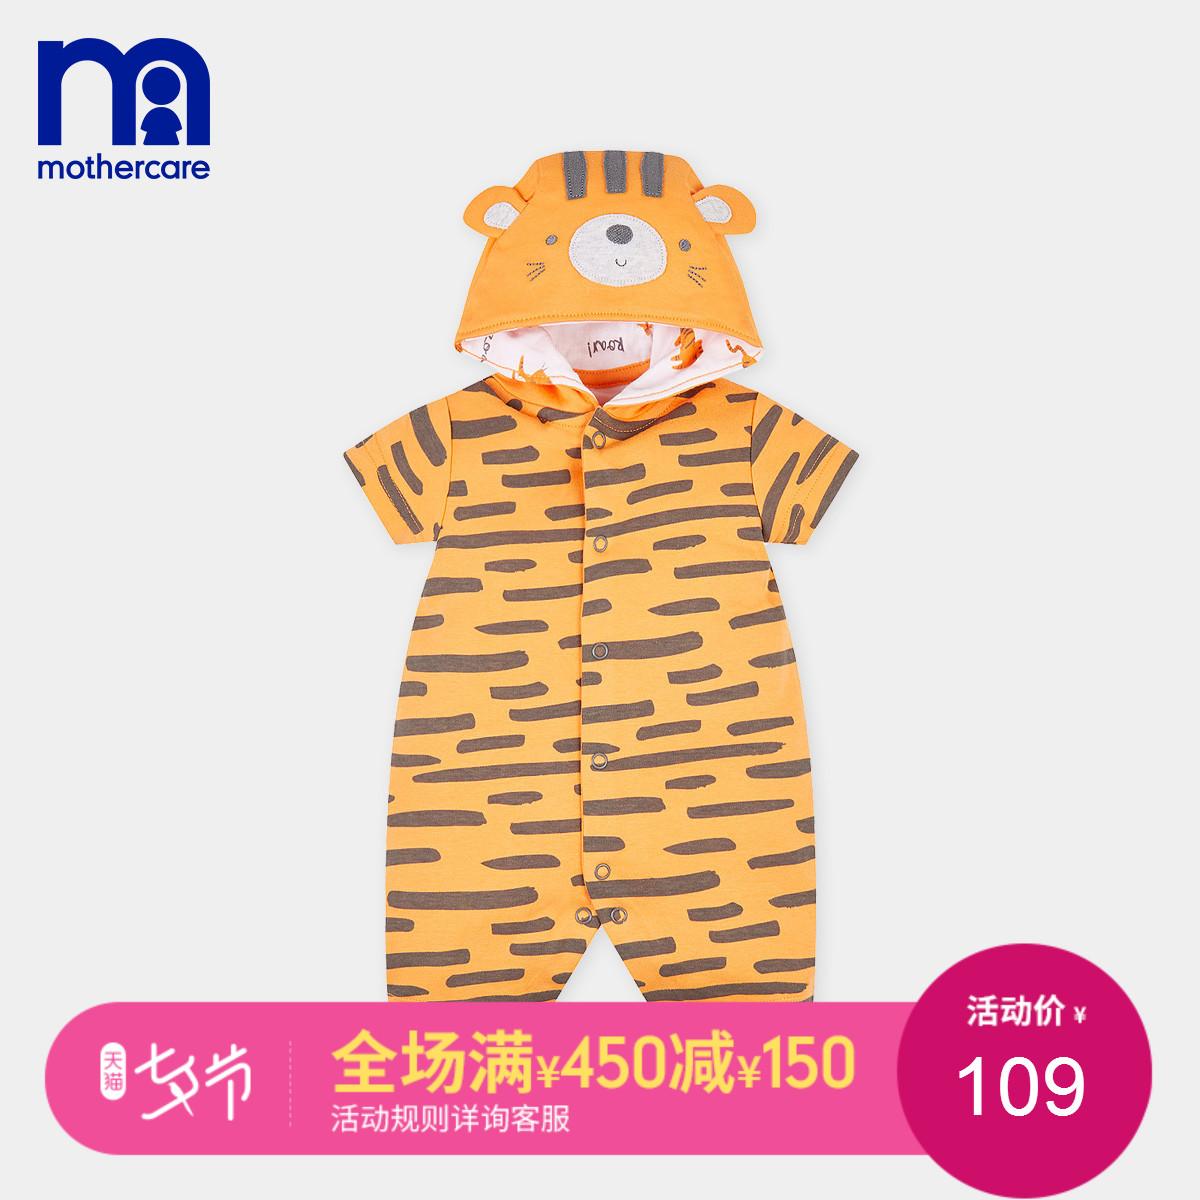 mothercare新生婴儿衣服新款春秋初生0-3个月动物造型款连帽哈衣